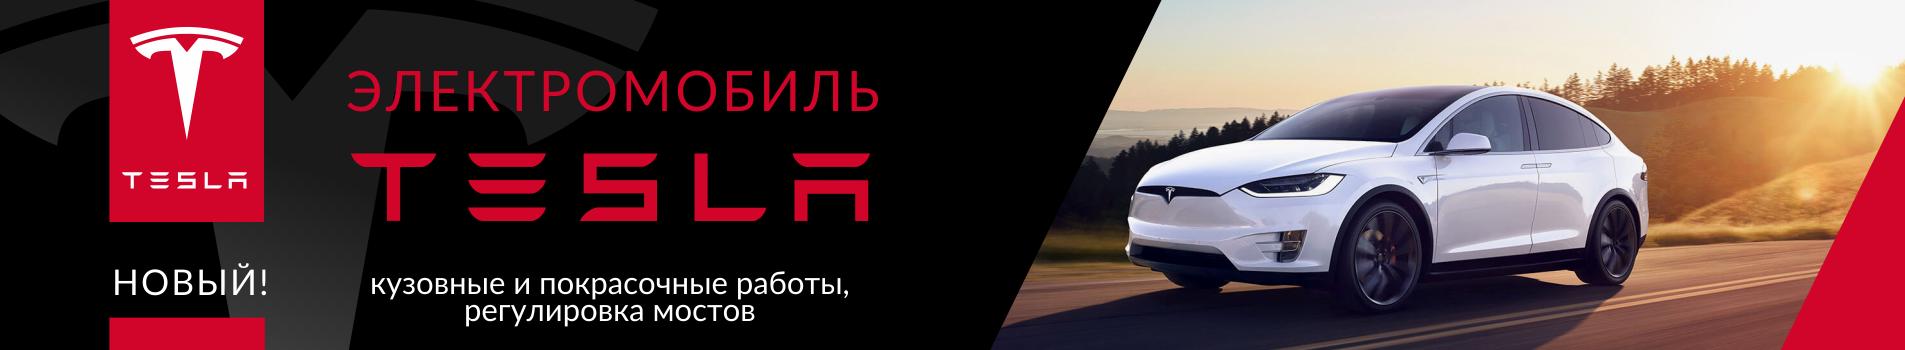 tesla_1905x350RUS_b